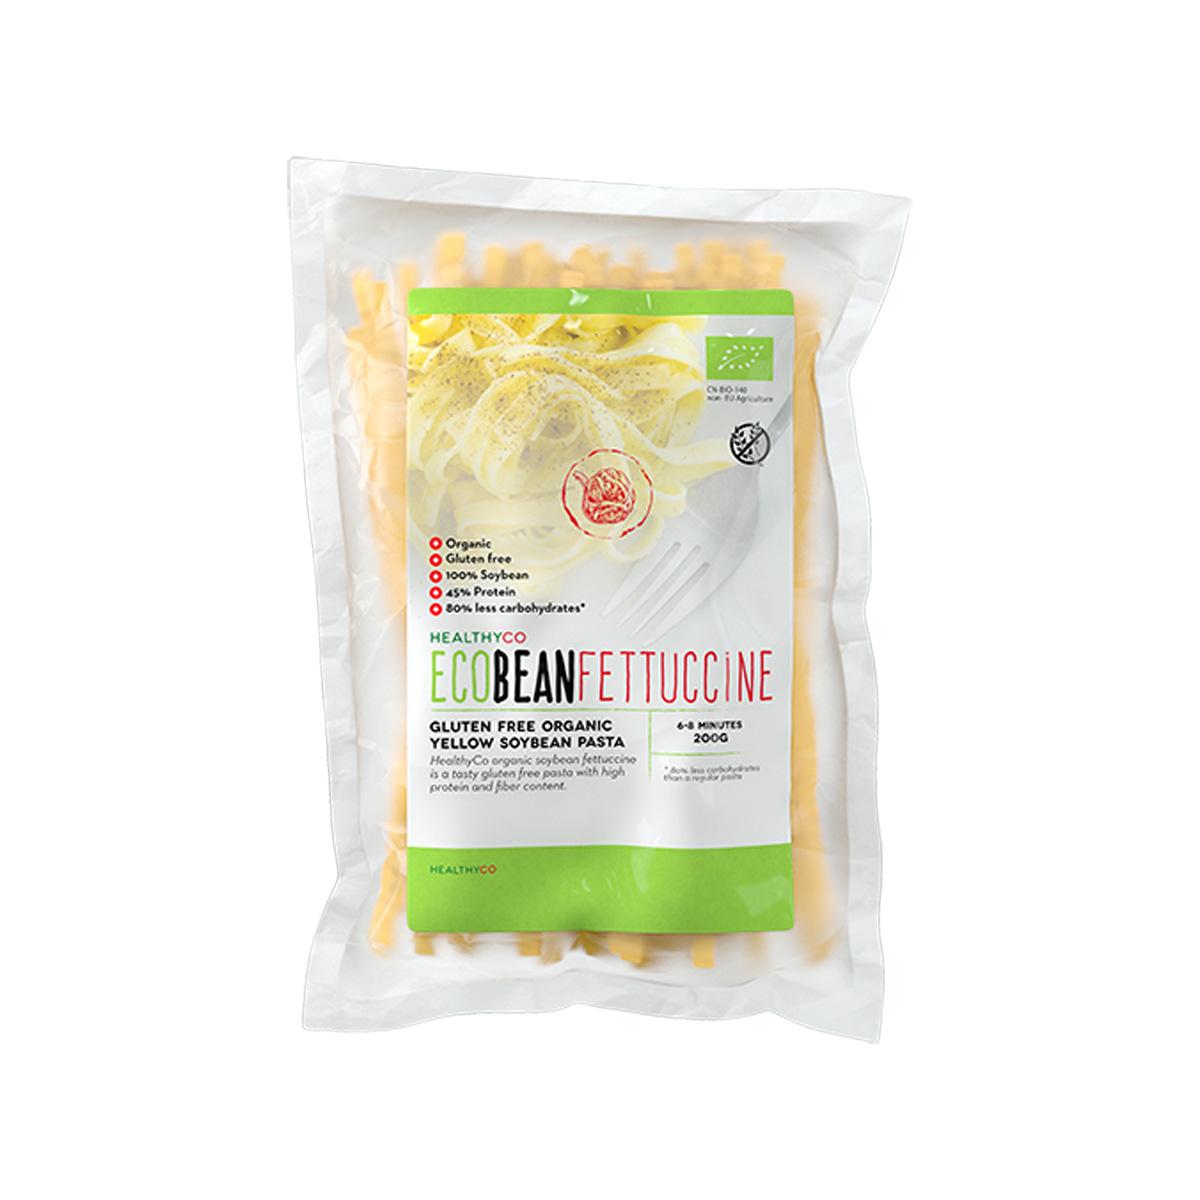 HealthyCo EKO Bean fettuccine 200 g